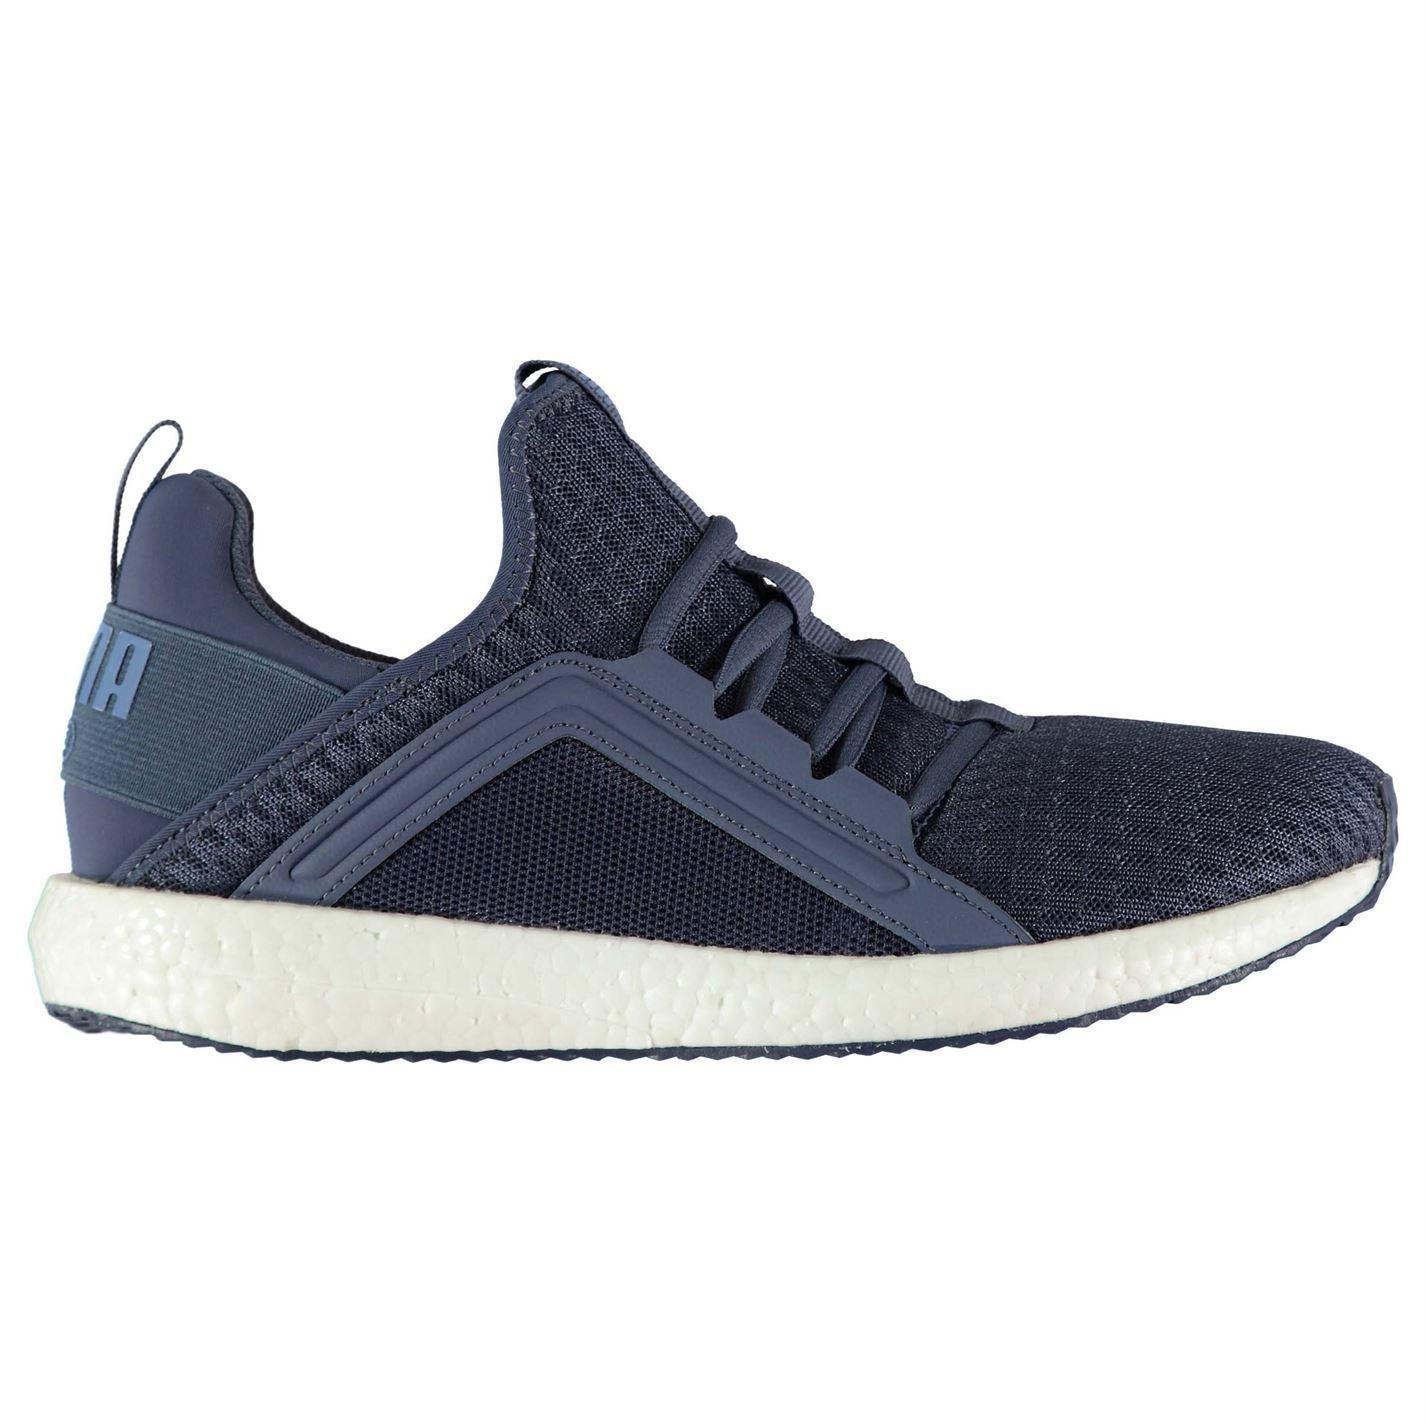 dd19de7e960 ... Puma Mega NRGY Running Shoes Womens Blue Run Jogging Trainers Sneakers  ...